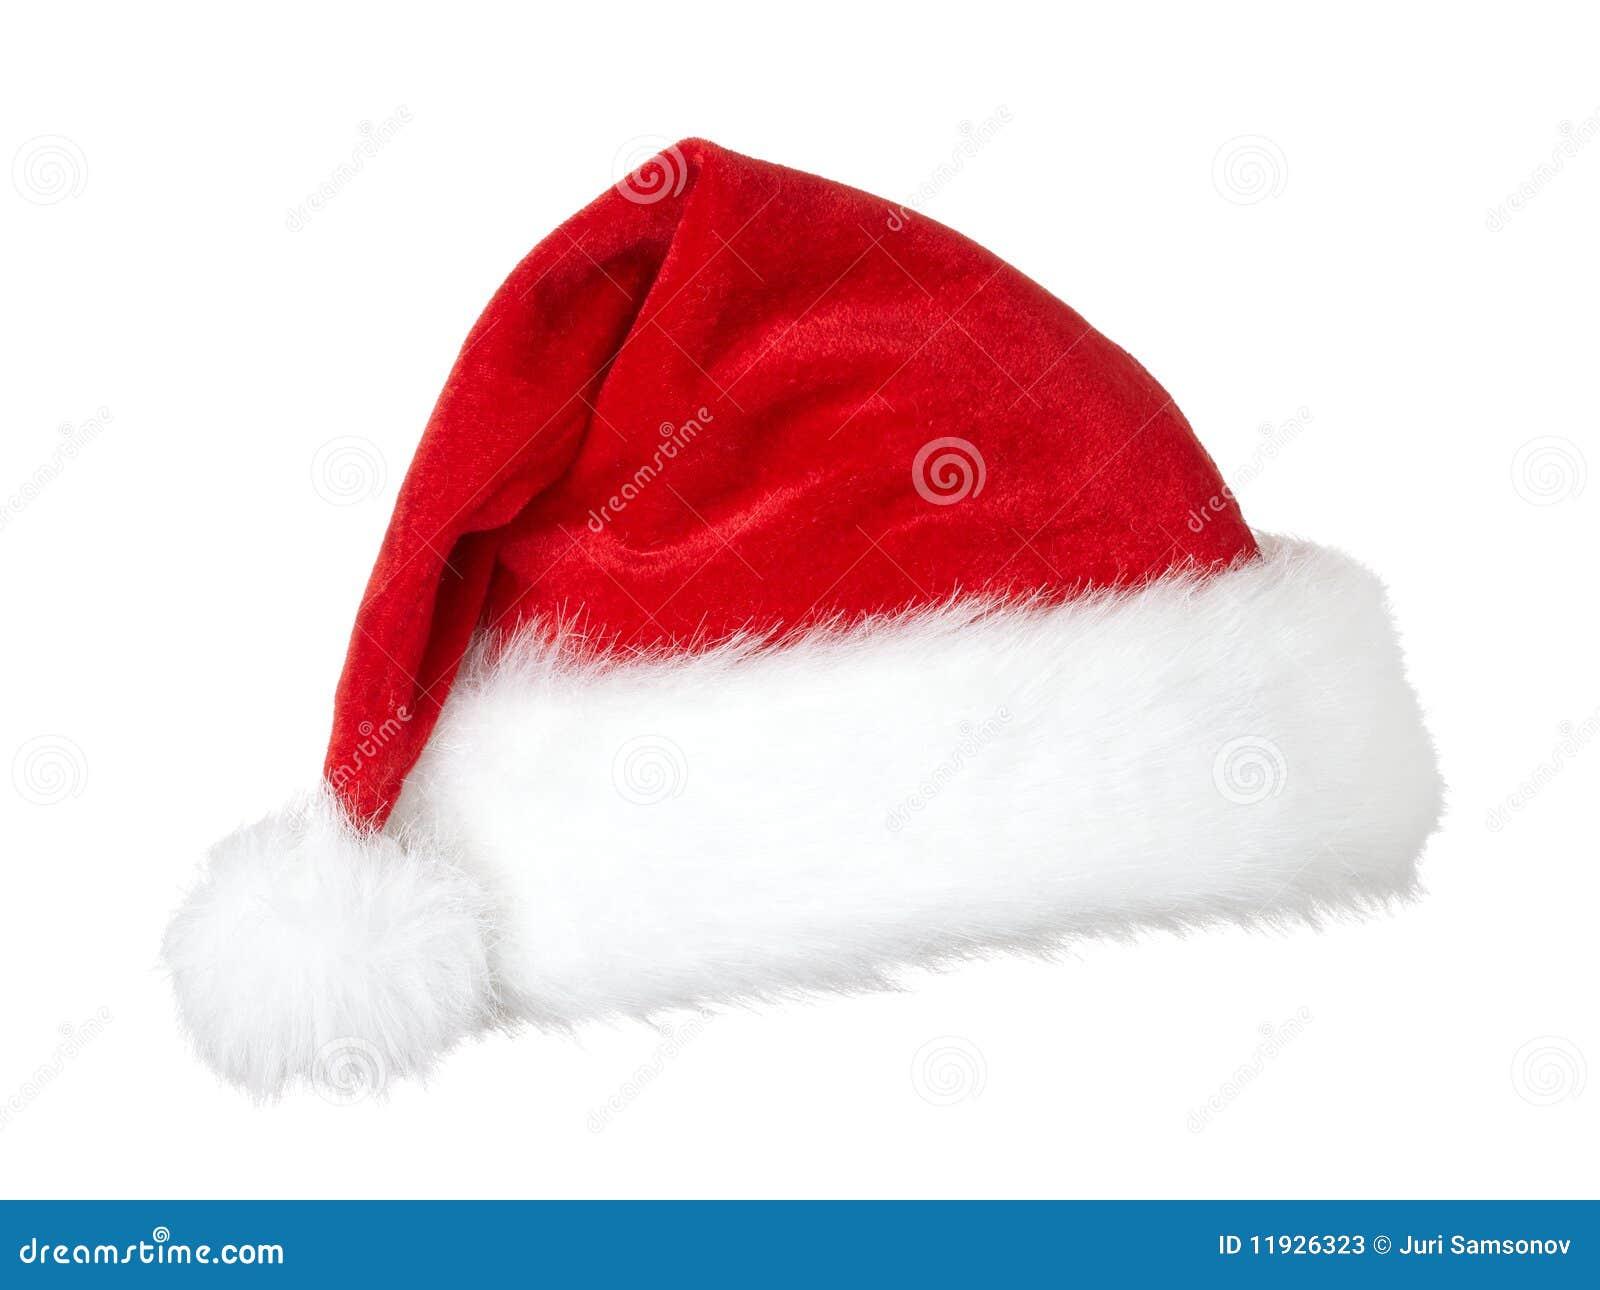 Sombrero de Papá Noel.